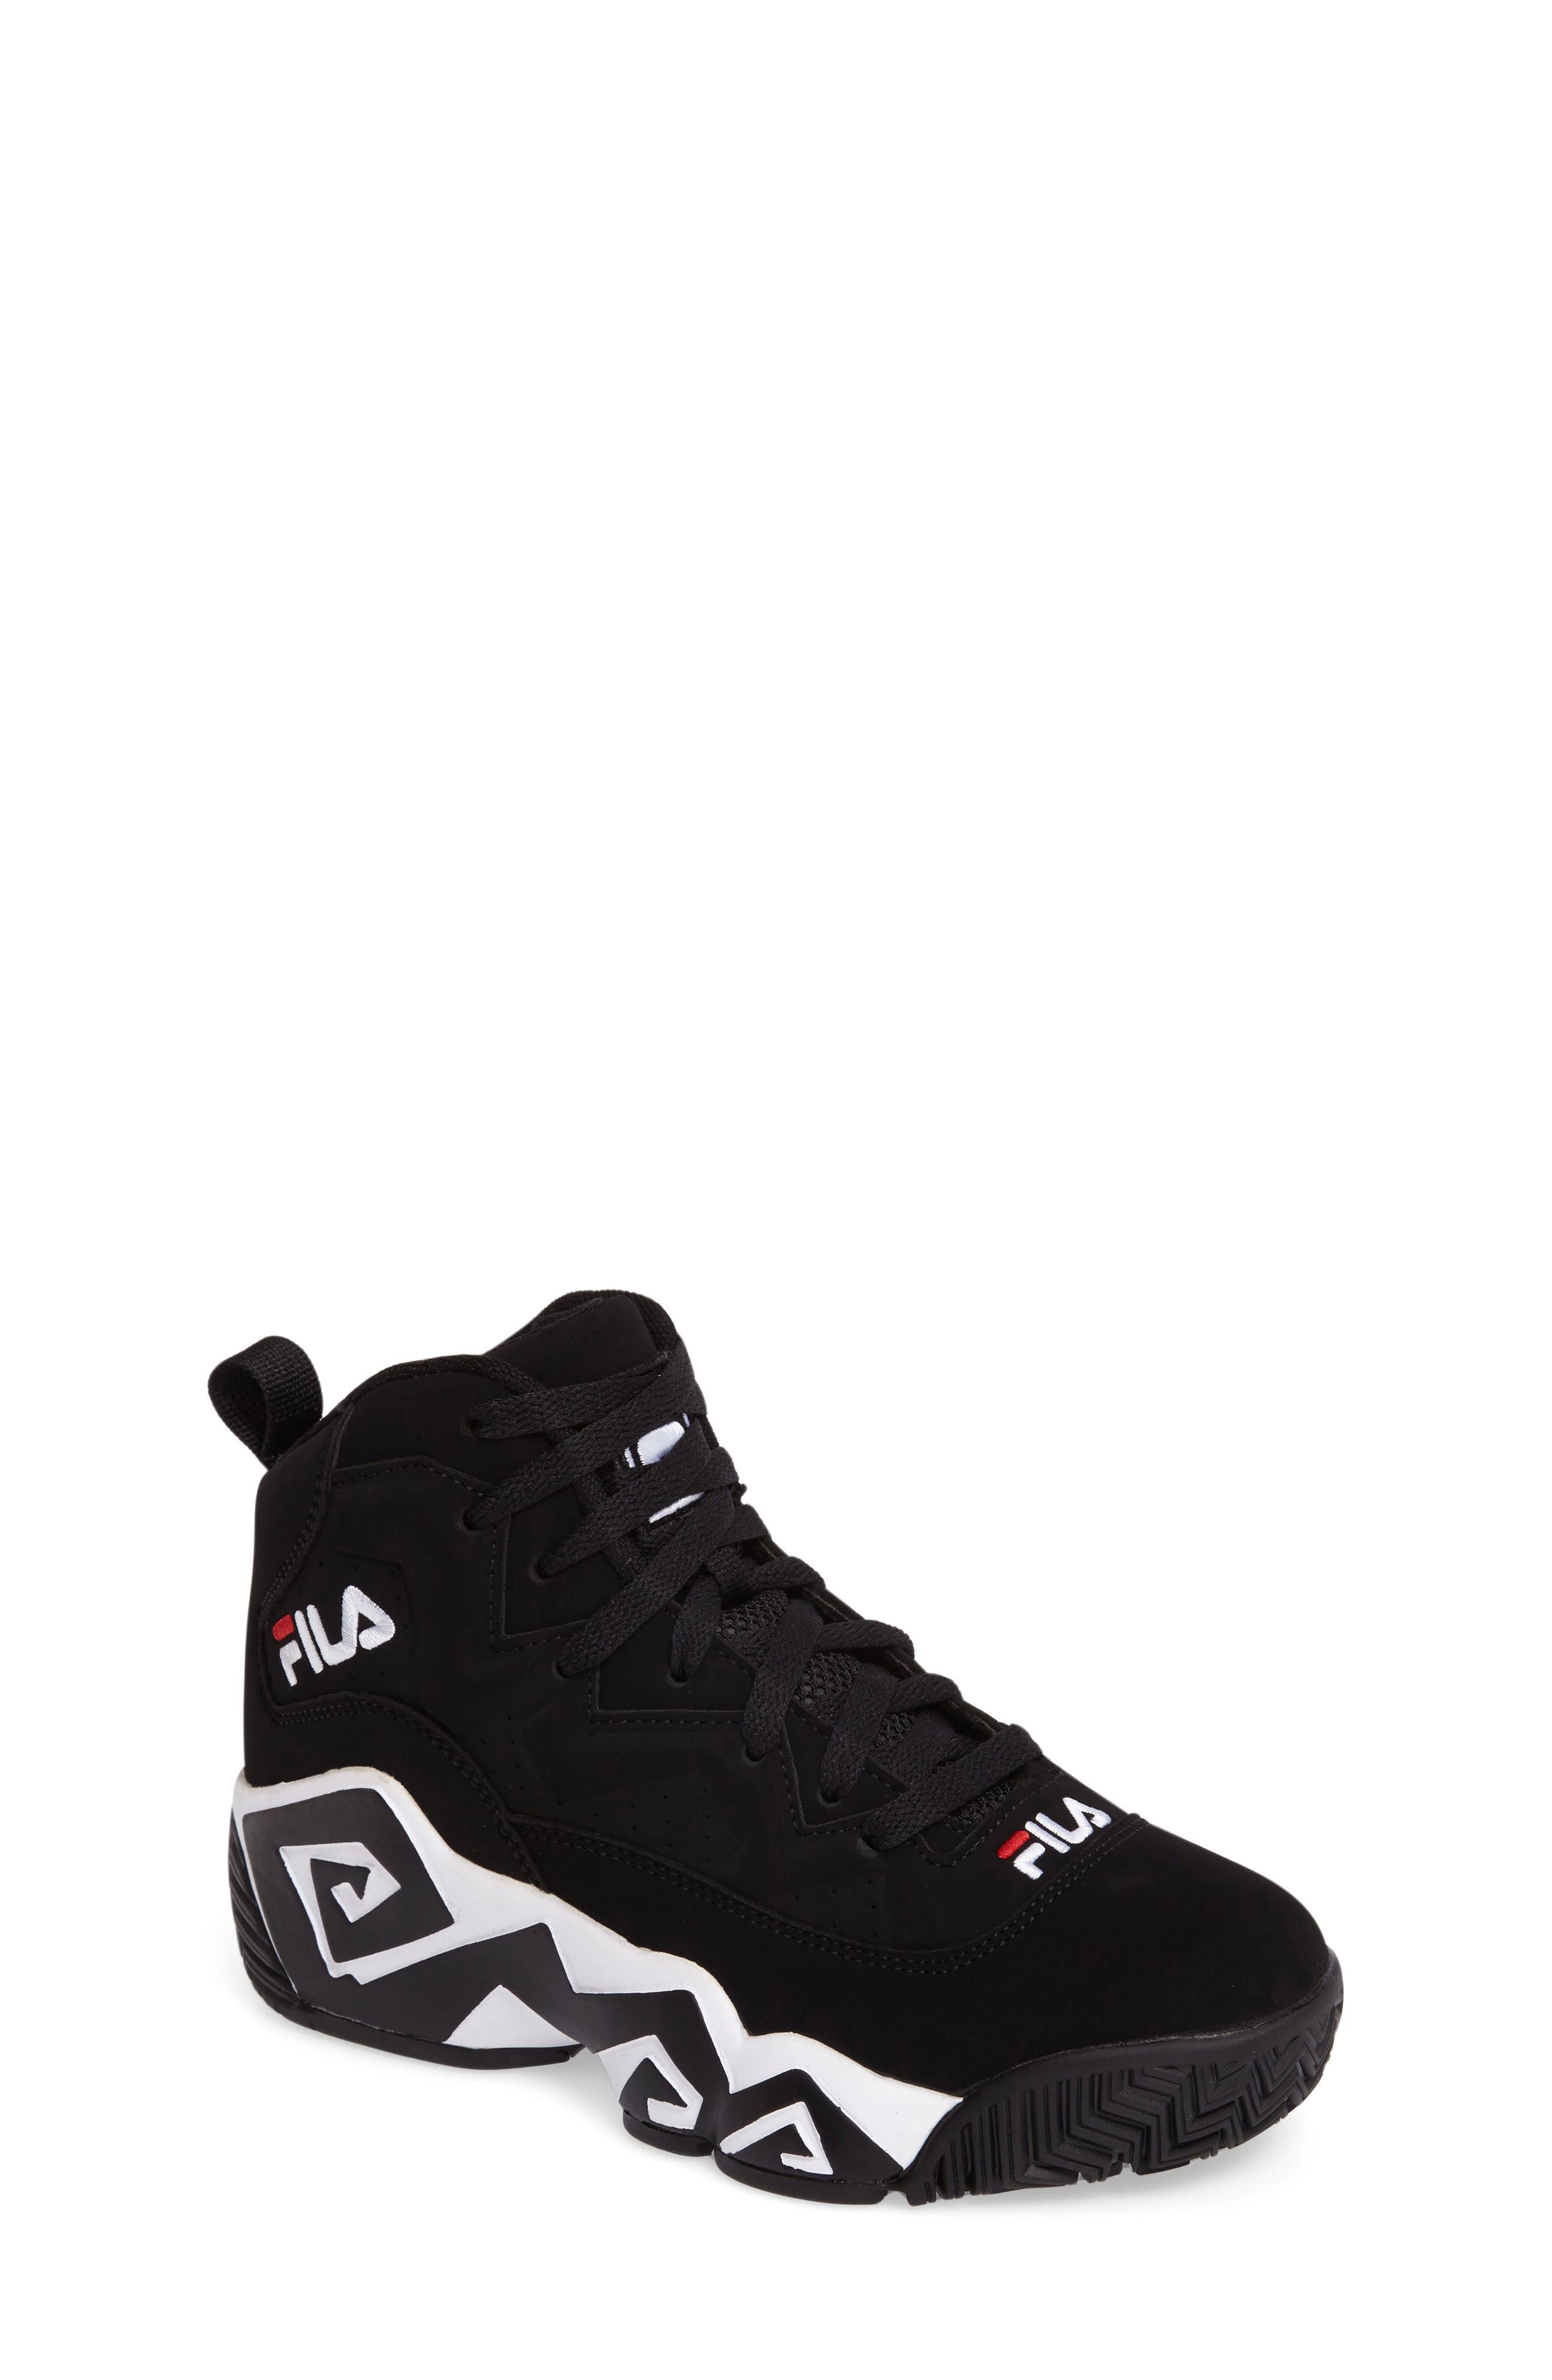 FILA Heritage Sneaker (Big Kid)